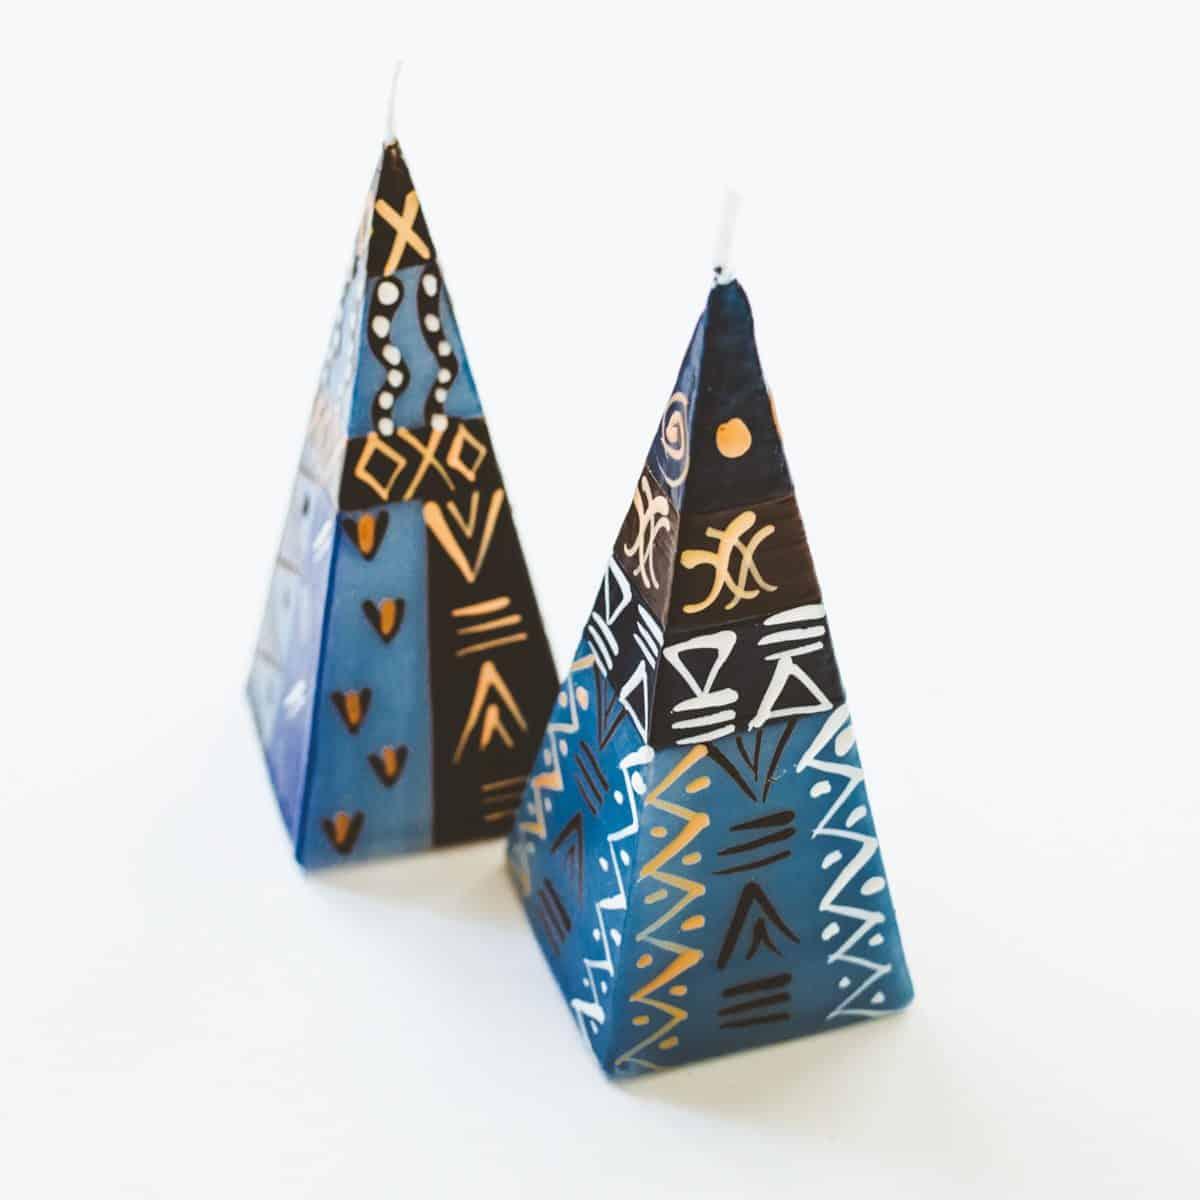 GlobeIn December 2016 Artisan Box Spoiler - Handpainted Candle Set